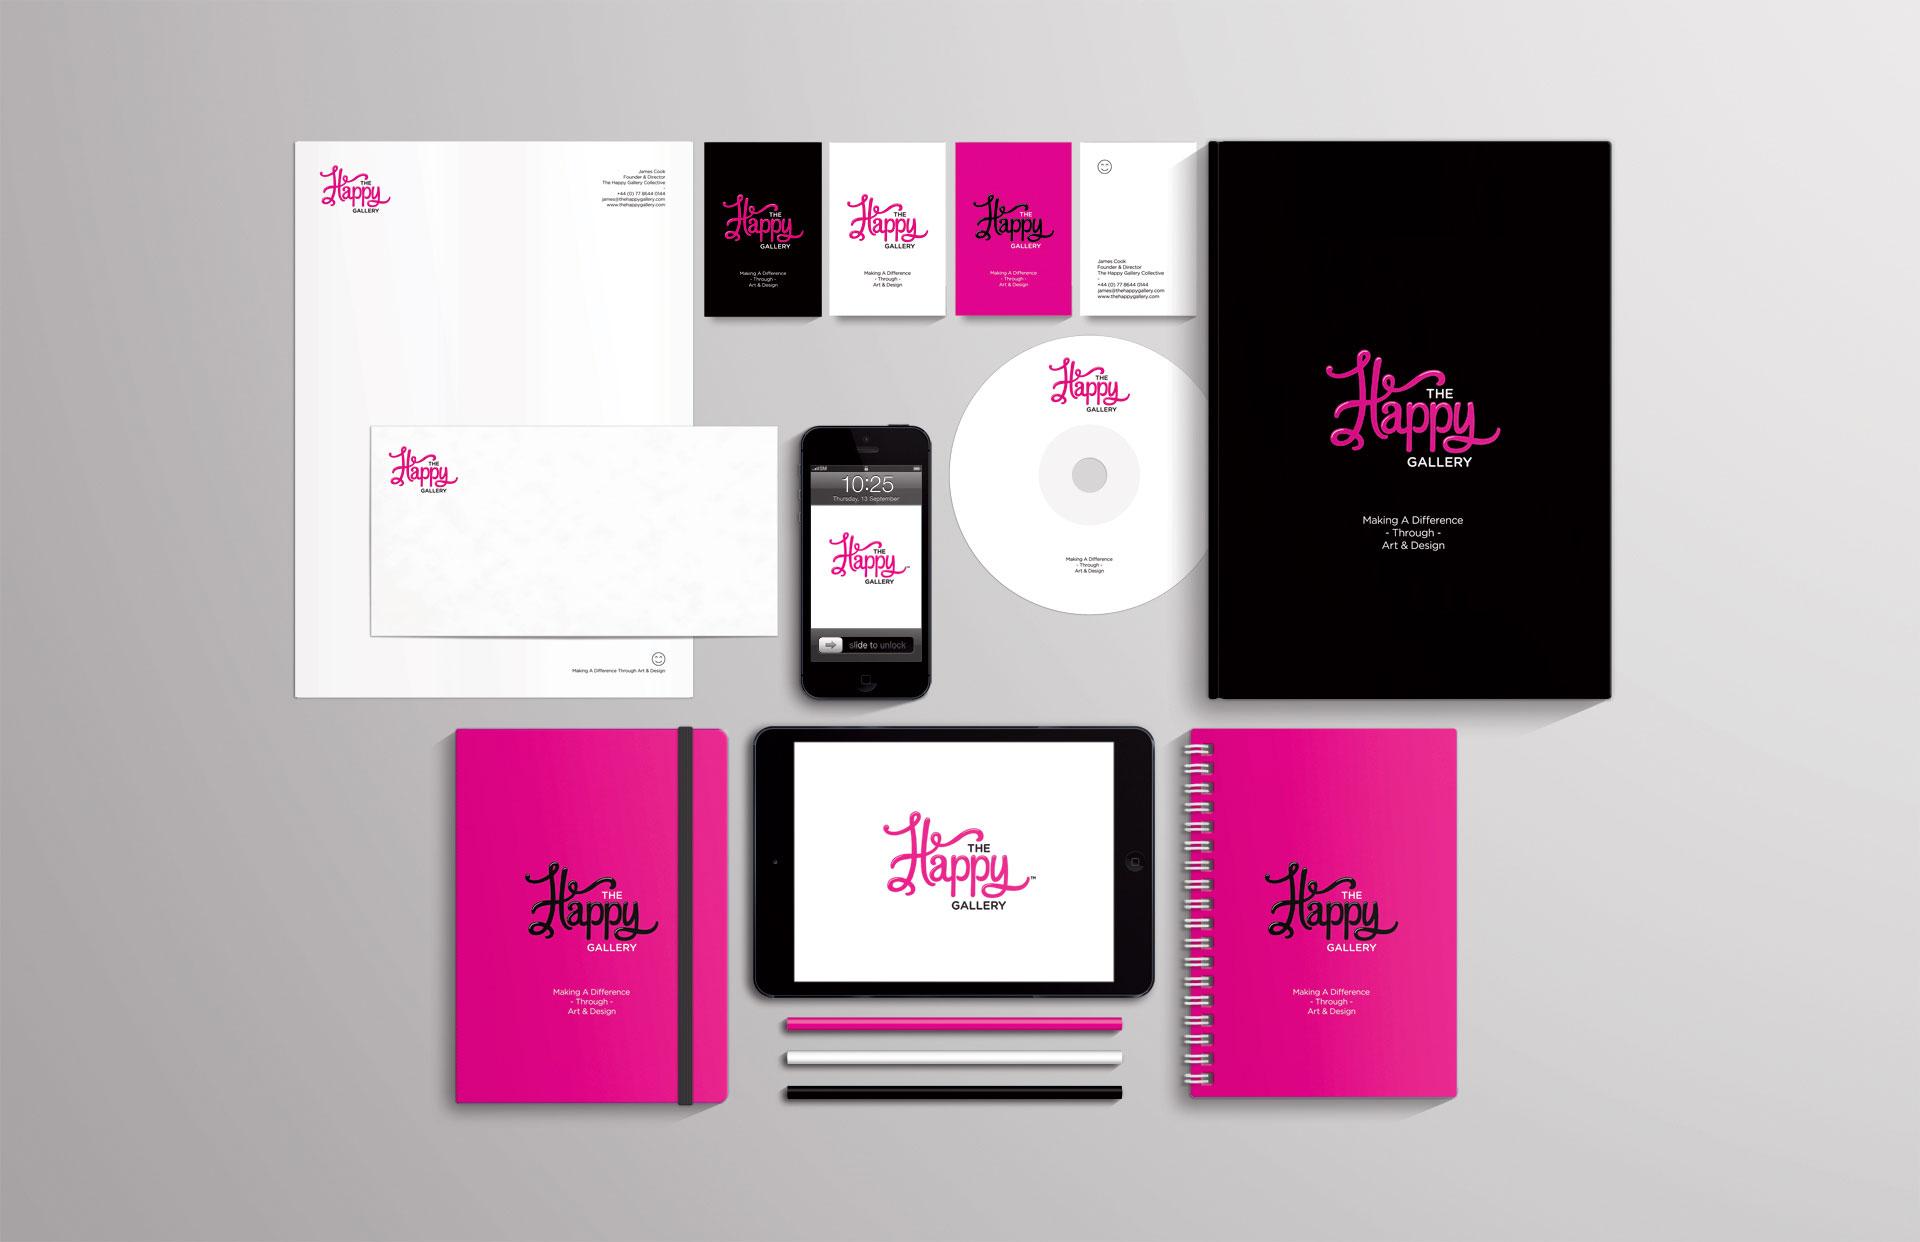 Happy-Stationery-Branding_Web.jpg